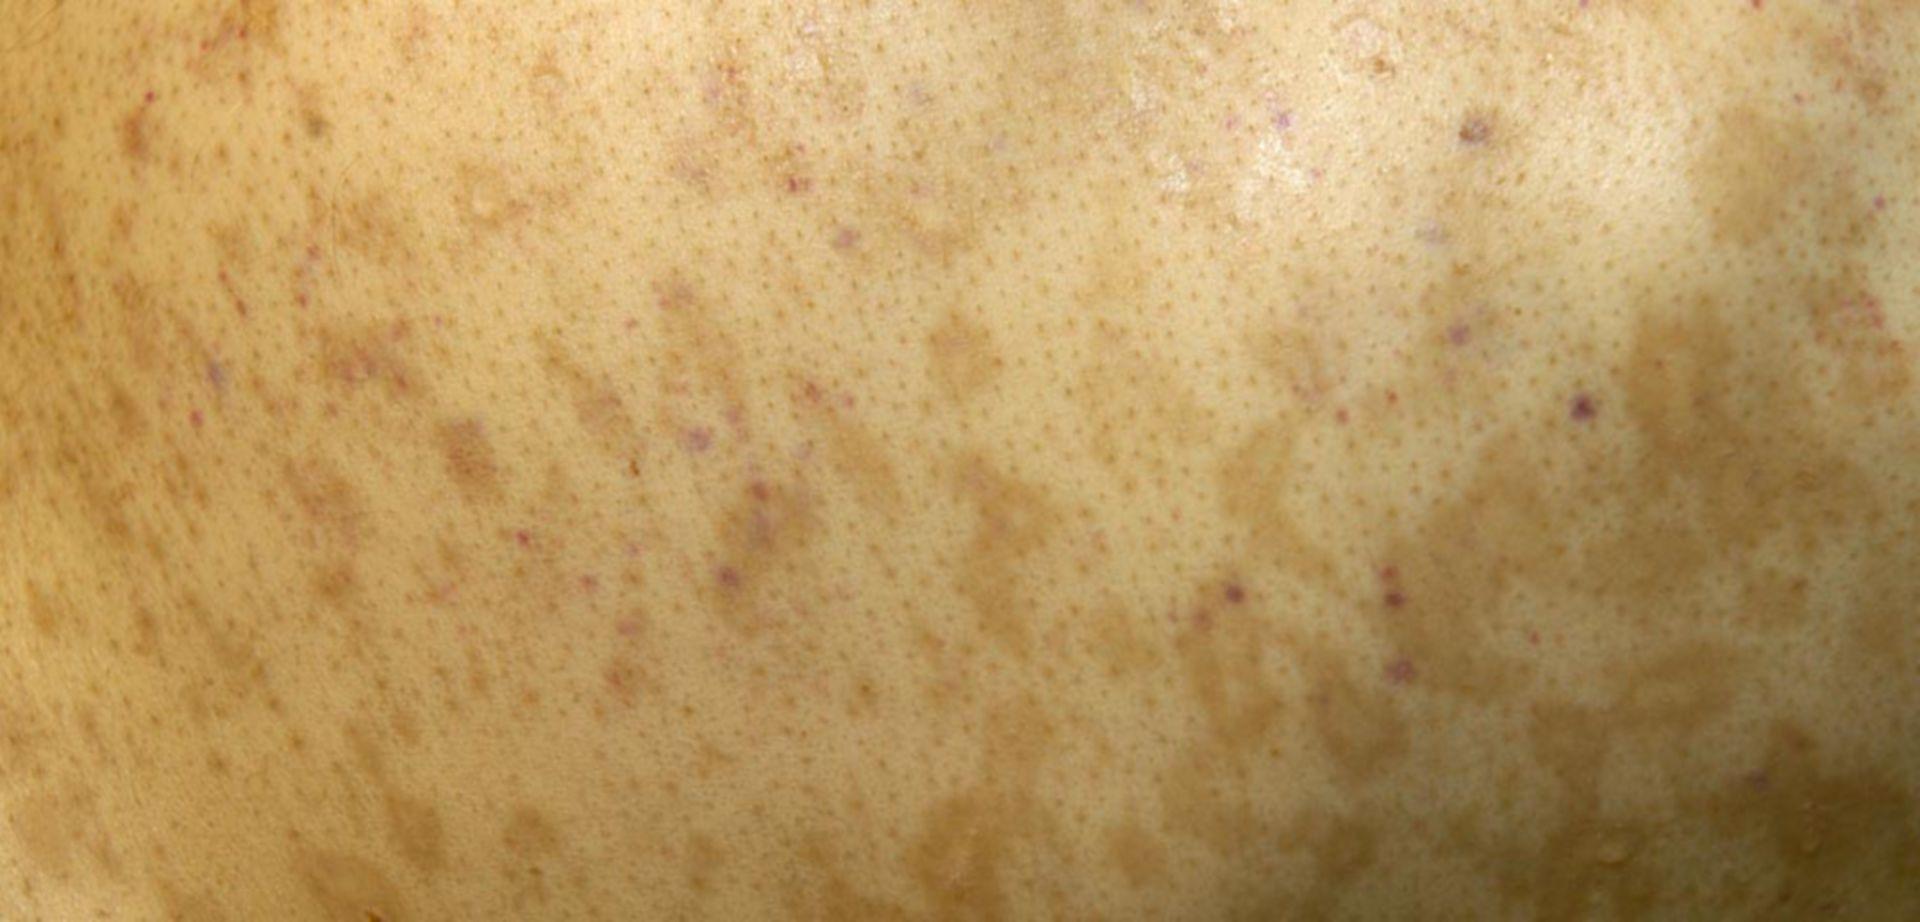 Akute Graft-versus-Host-Erkrankung der Haut